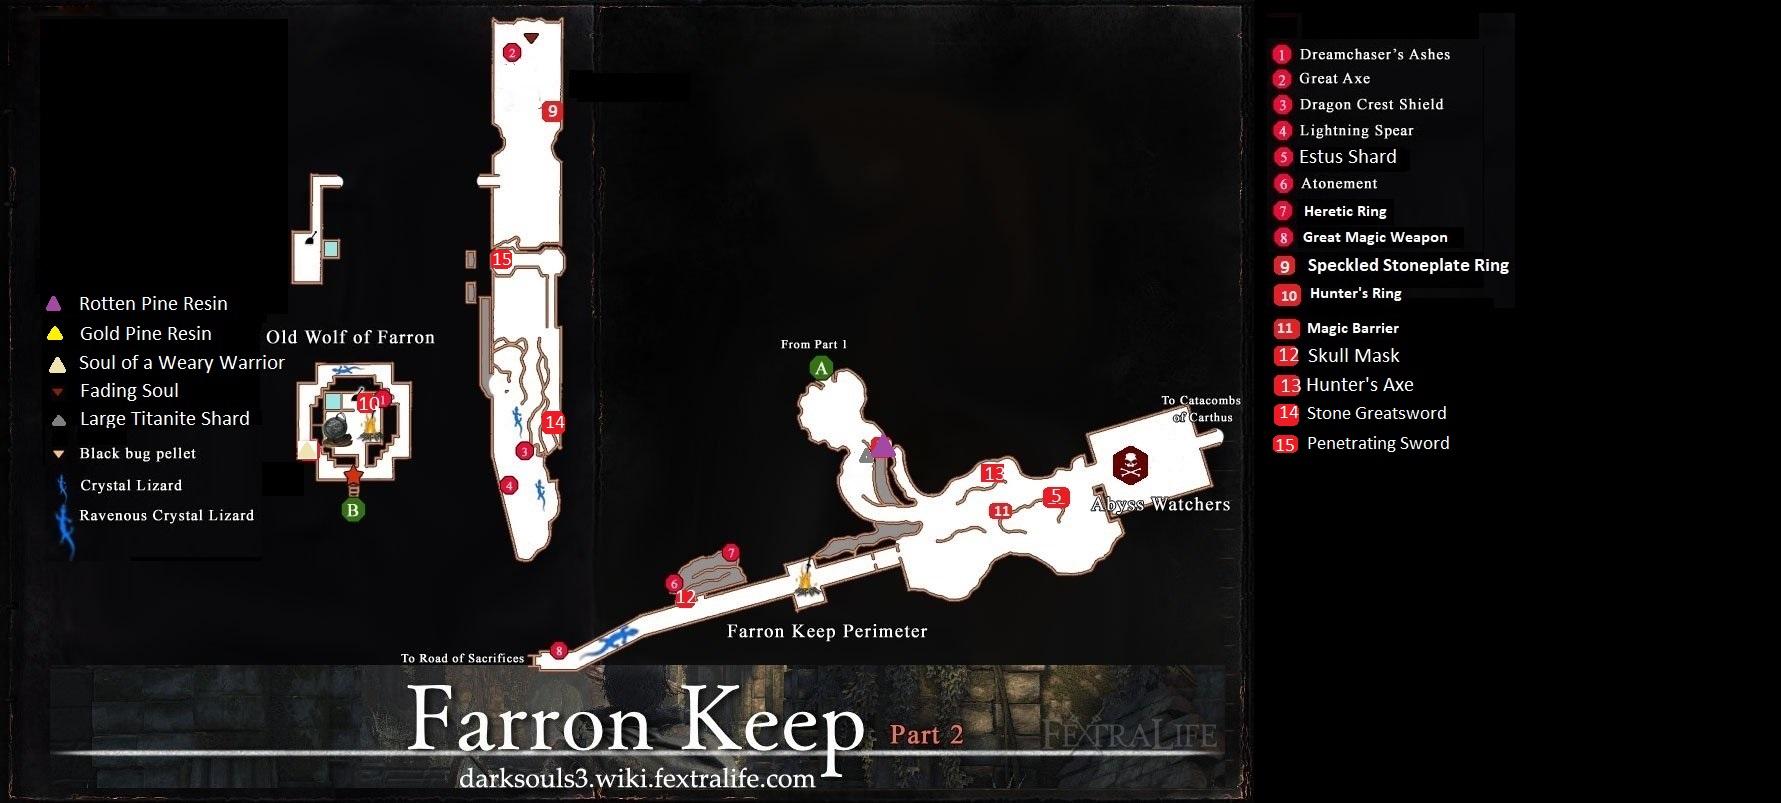 farron_keep_map2.jpg